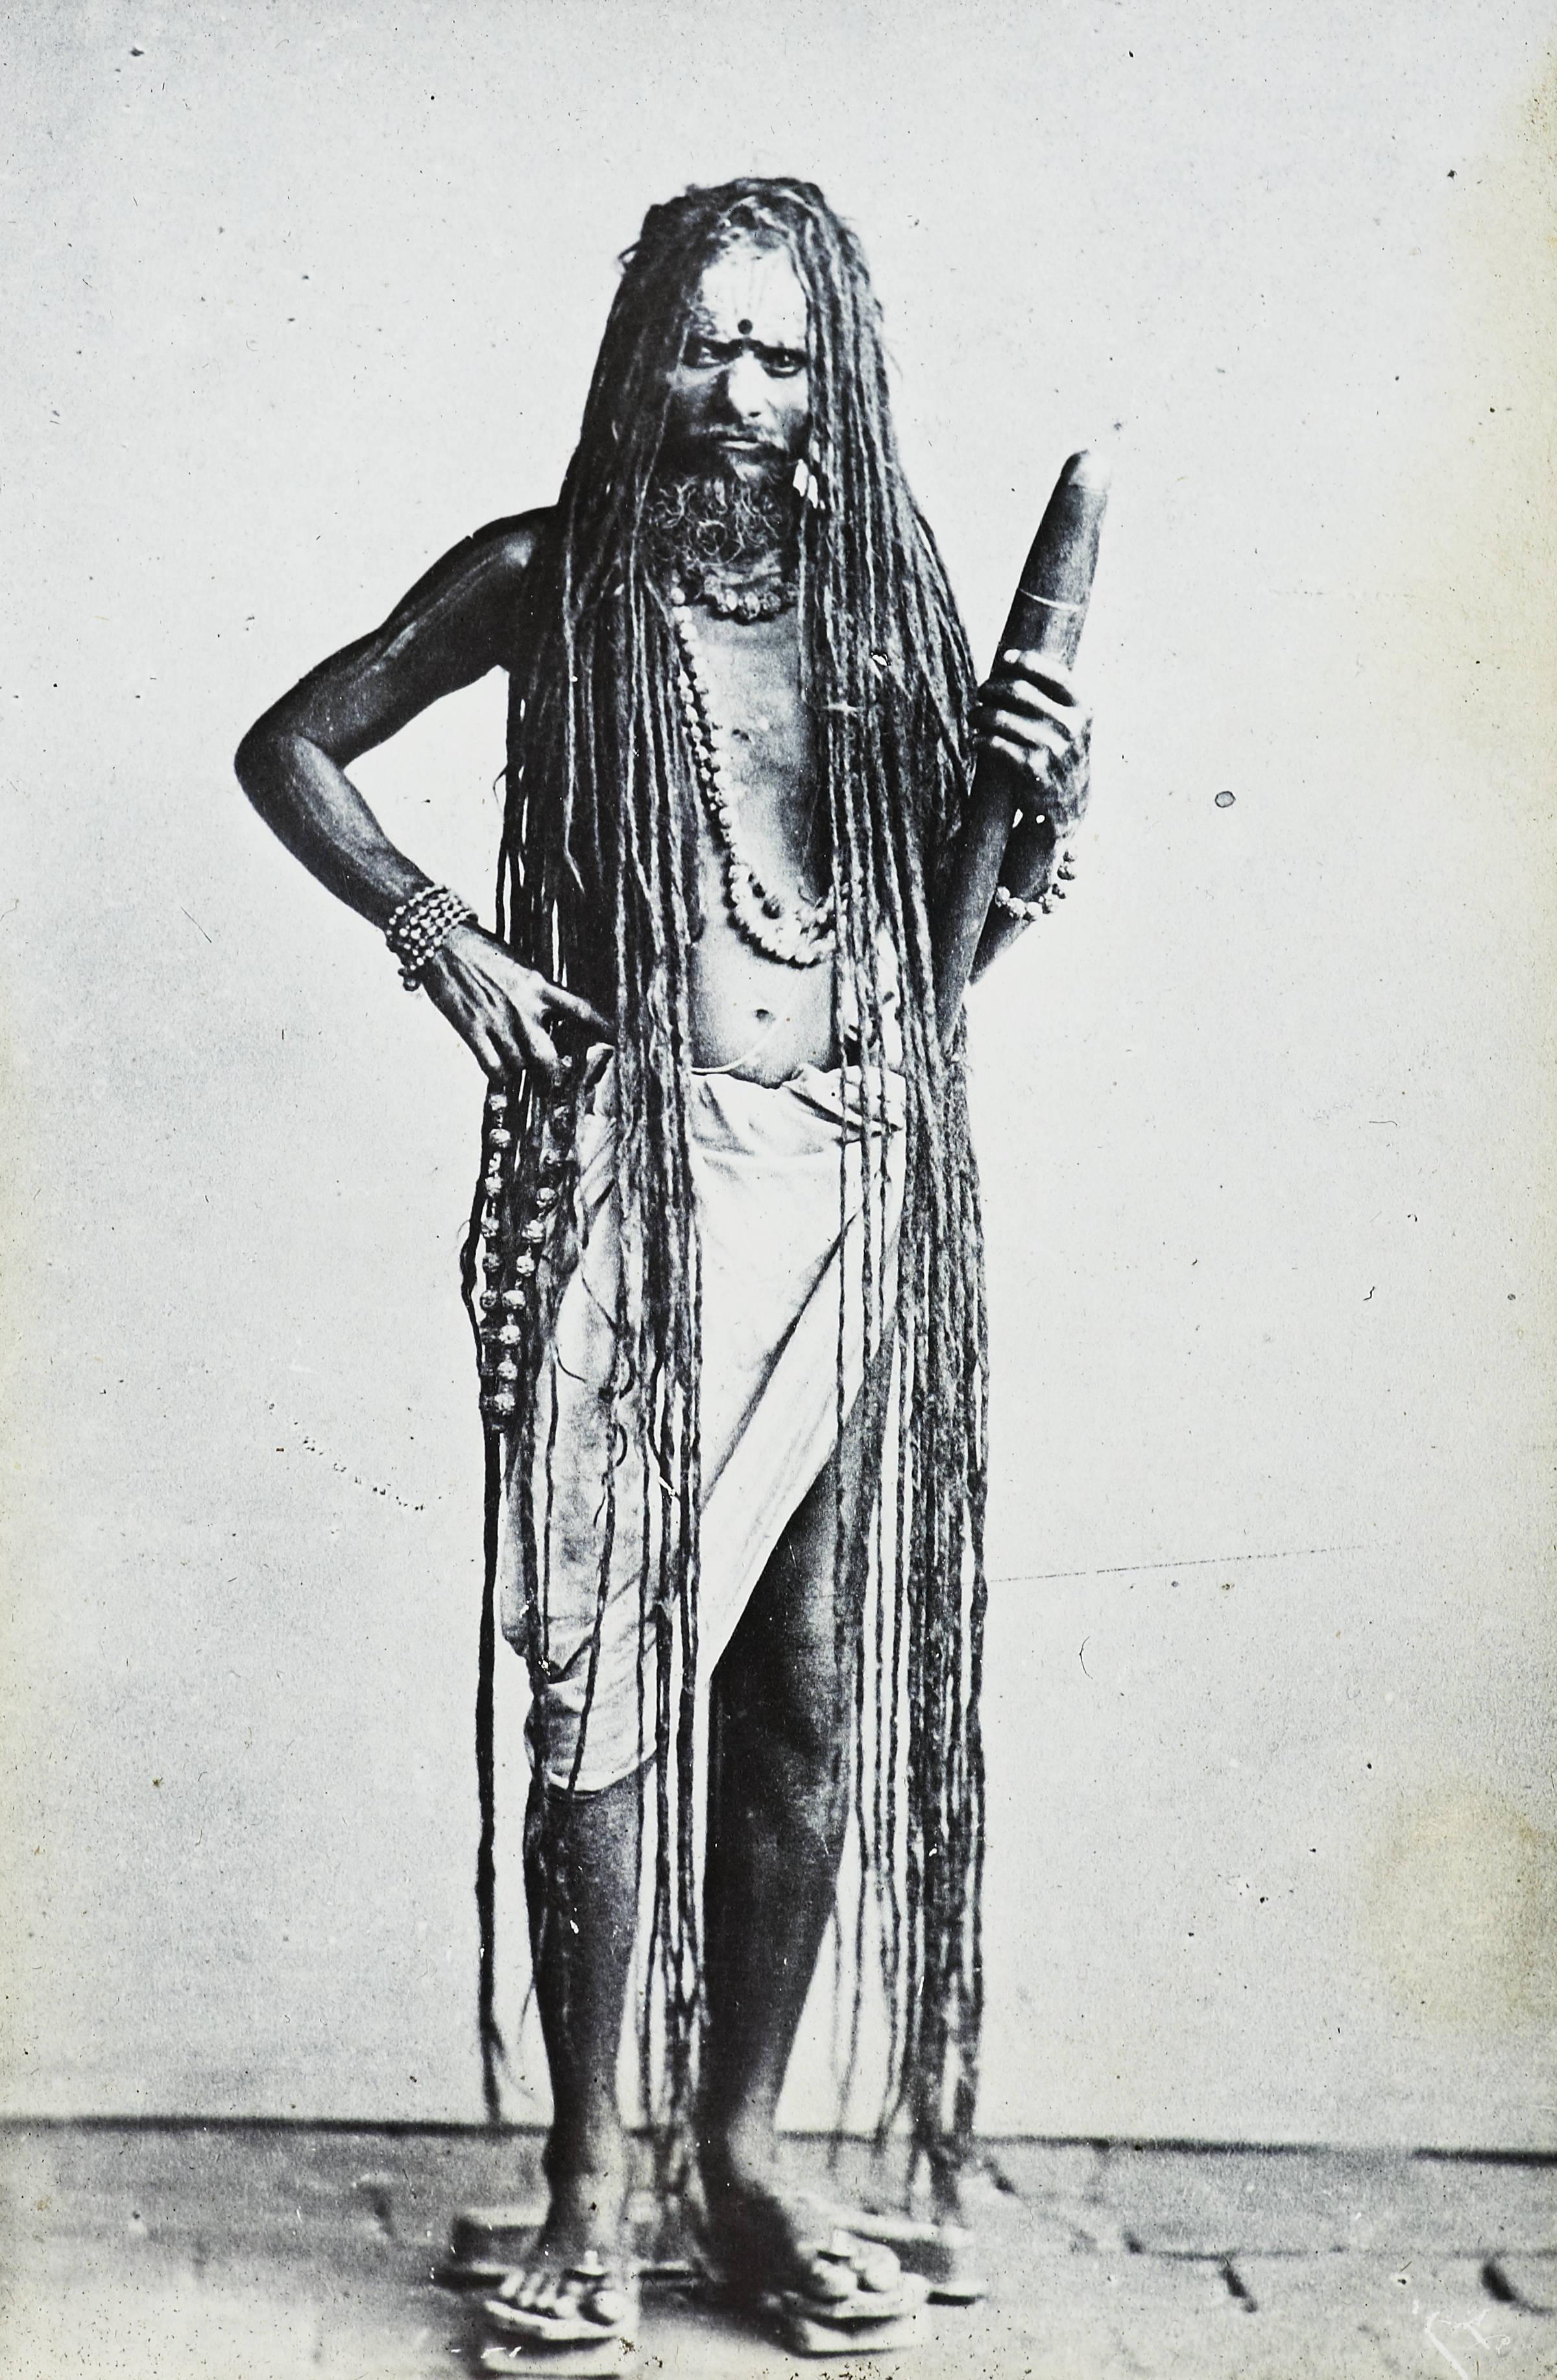 File:Sadhu with long hair, India, ca. 1920 (IMP-CSCNWW33